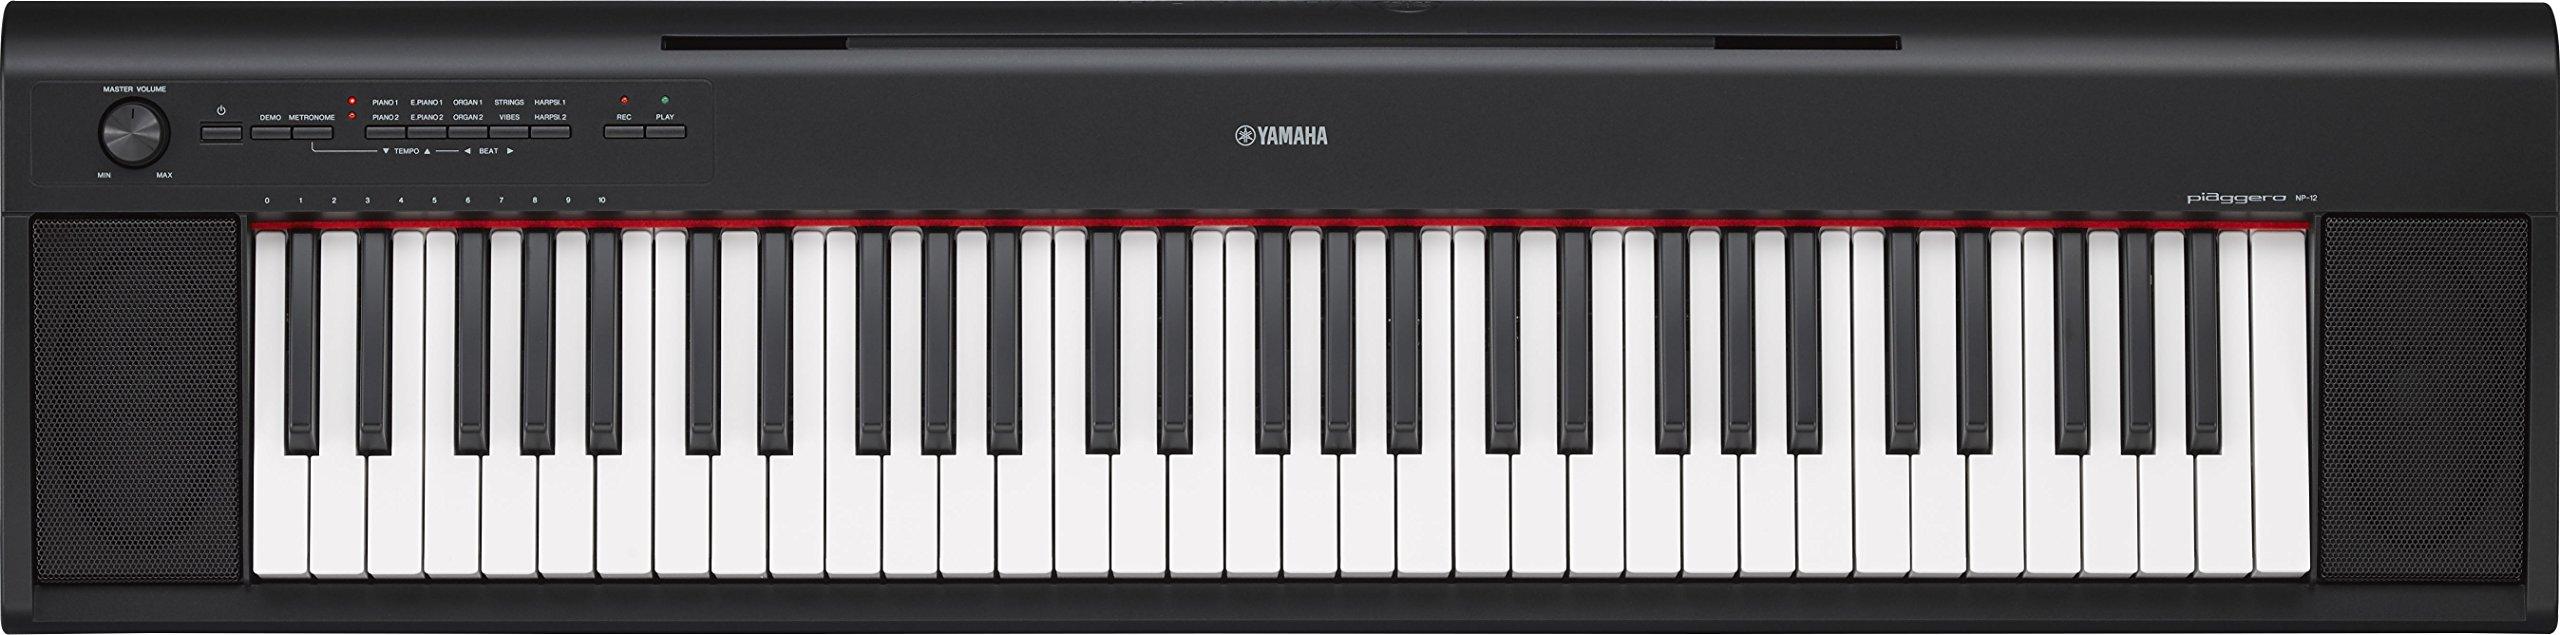 Yamaha NP12 61-Key Lightweight Portable Keyboard, Black (power adapter sold separately) by YAMAHA